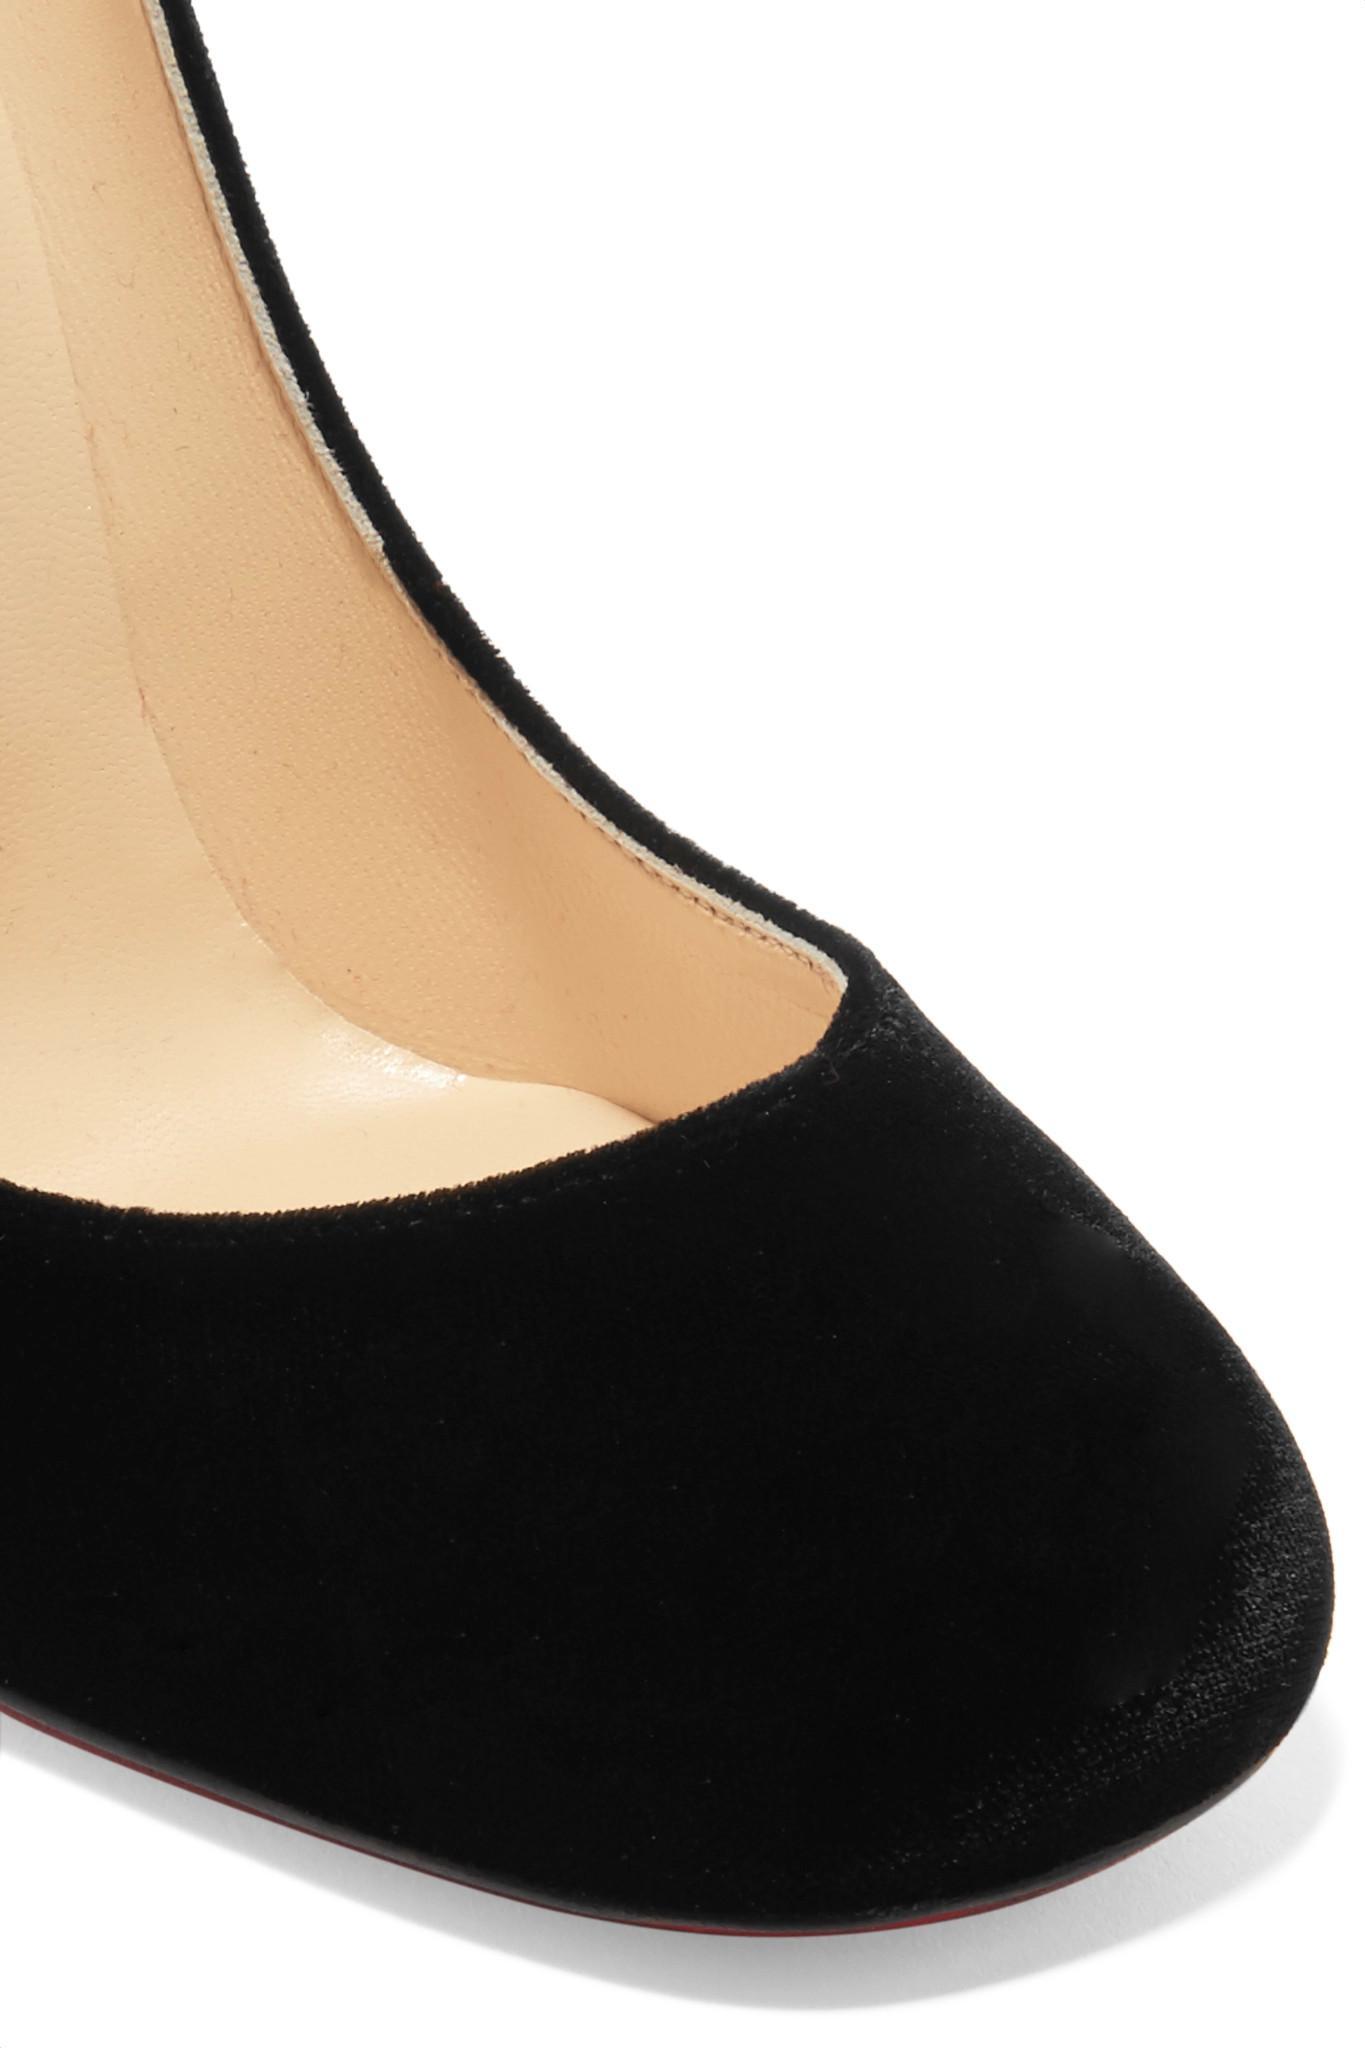 06e6d3d615ff Christian Louboutin - Black Cadrilla Corazon 100 Appliquéd Velvet Pumps -  Lyst. View fullscreen